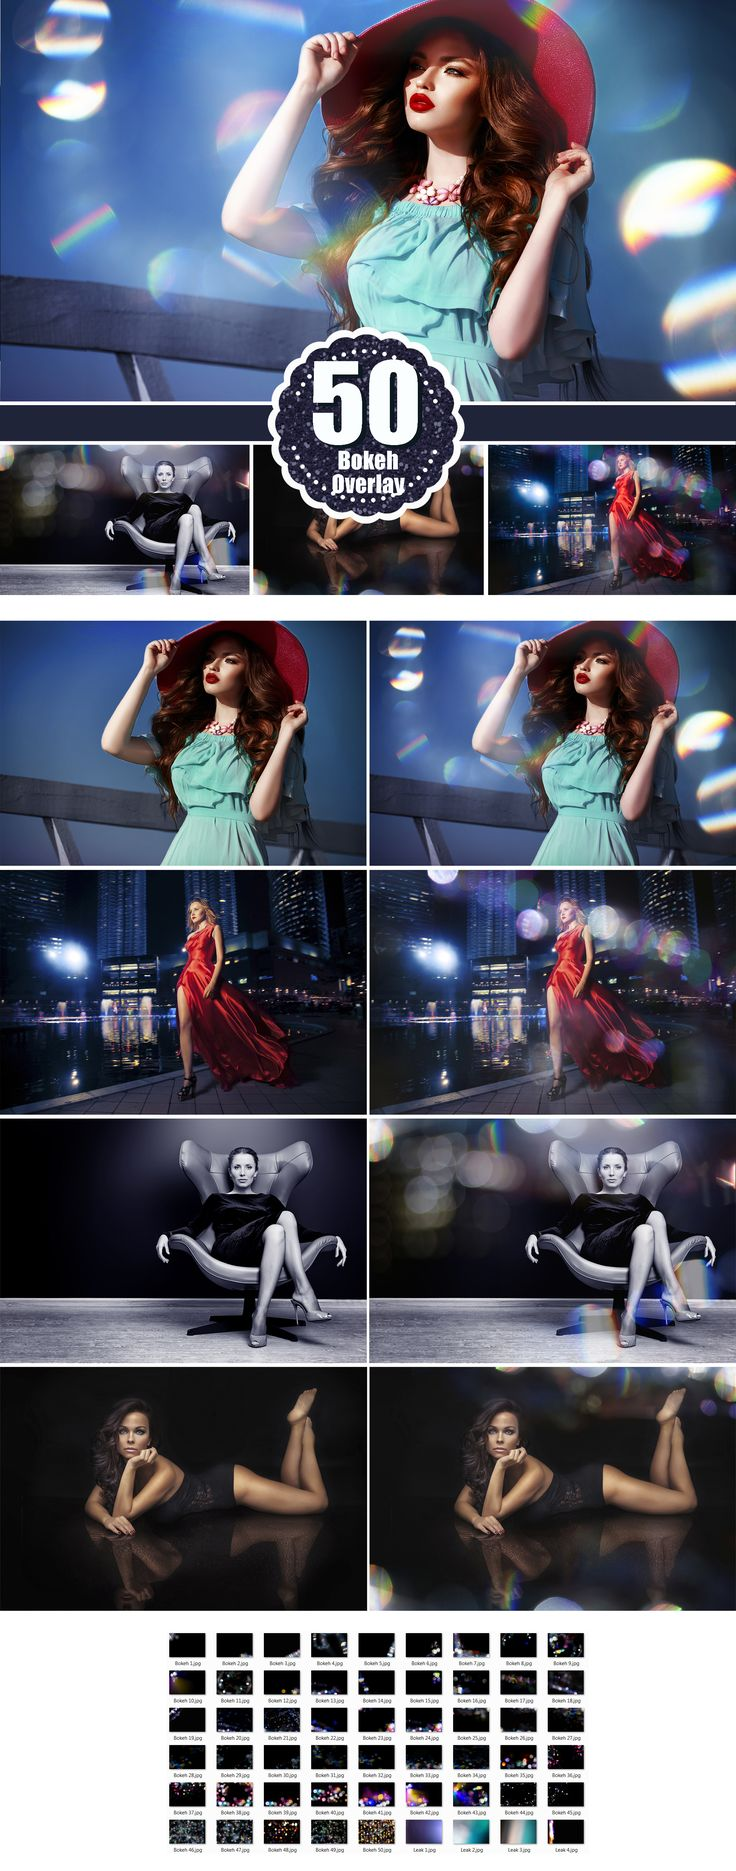 glamour fashion art bokeh Photoshop Overlays, romantic, wedding, gold overlays, sun, rays, light effect layers,haze, flare